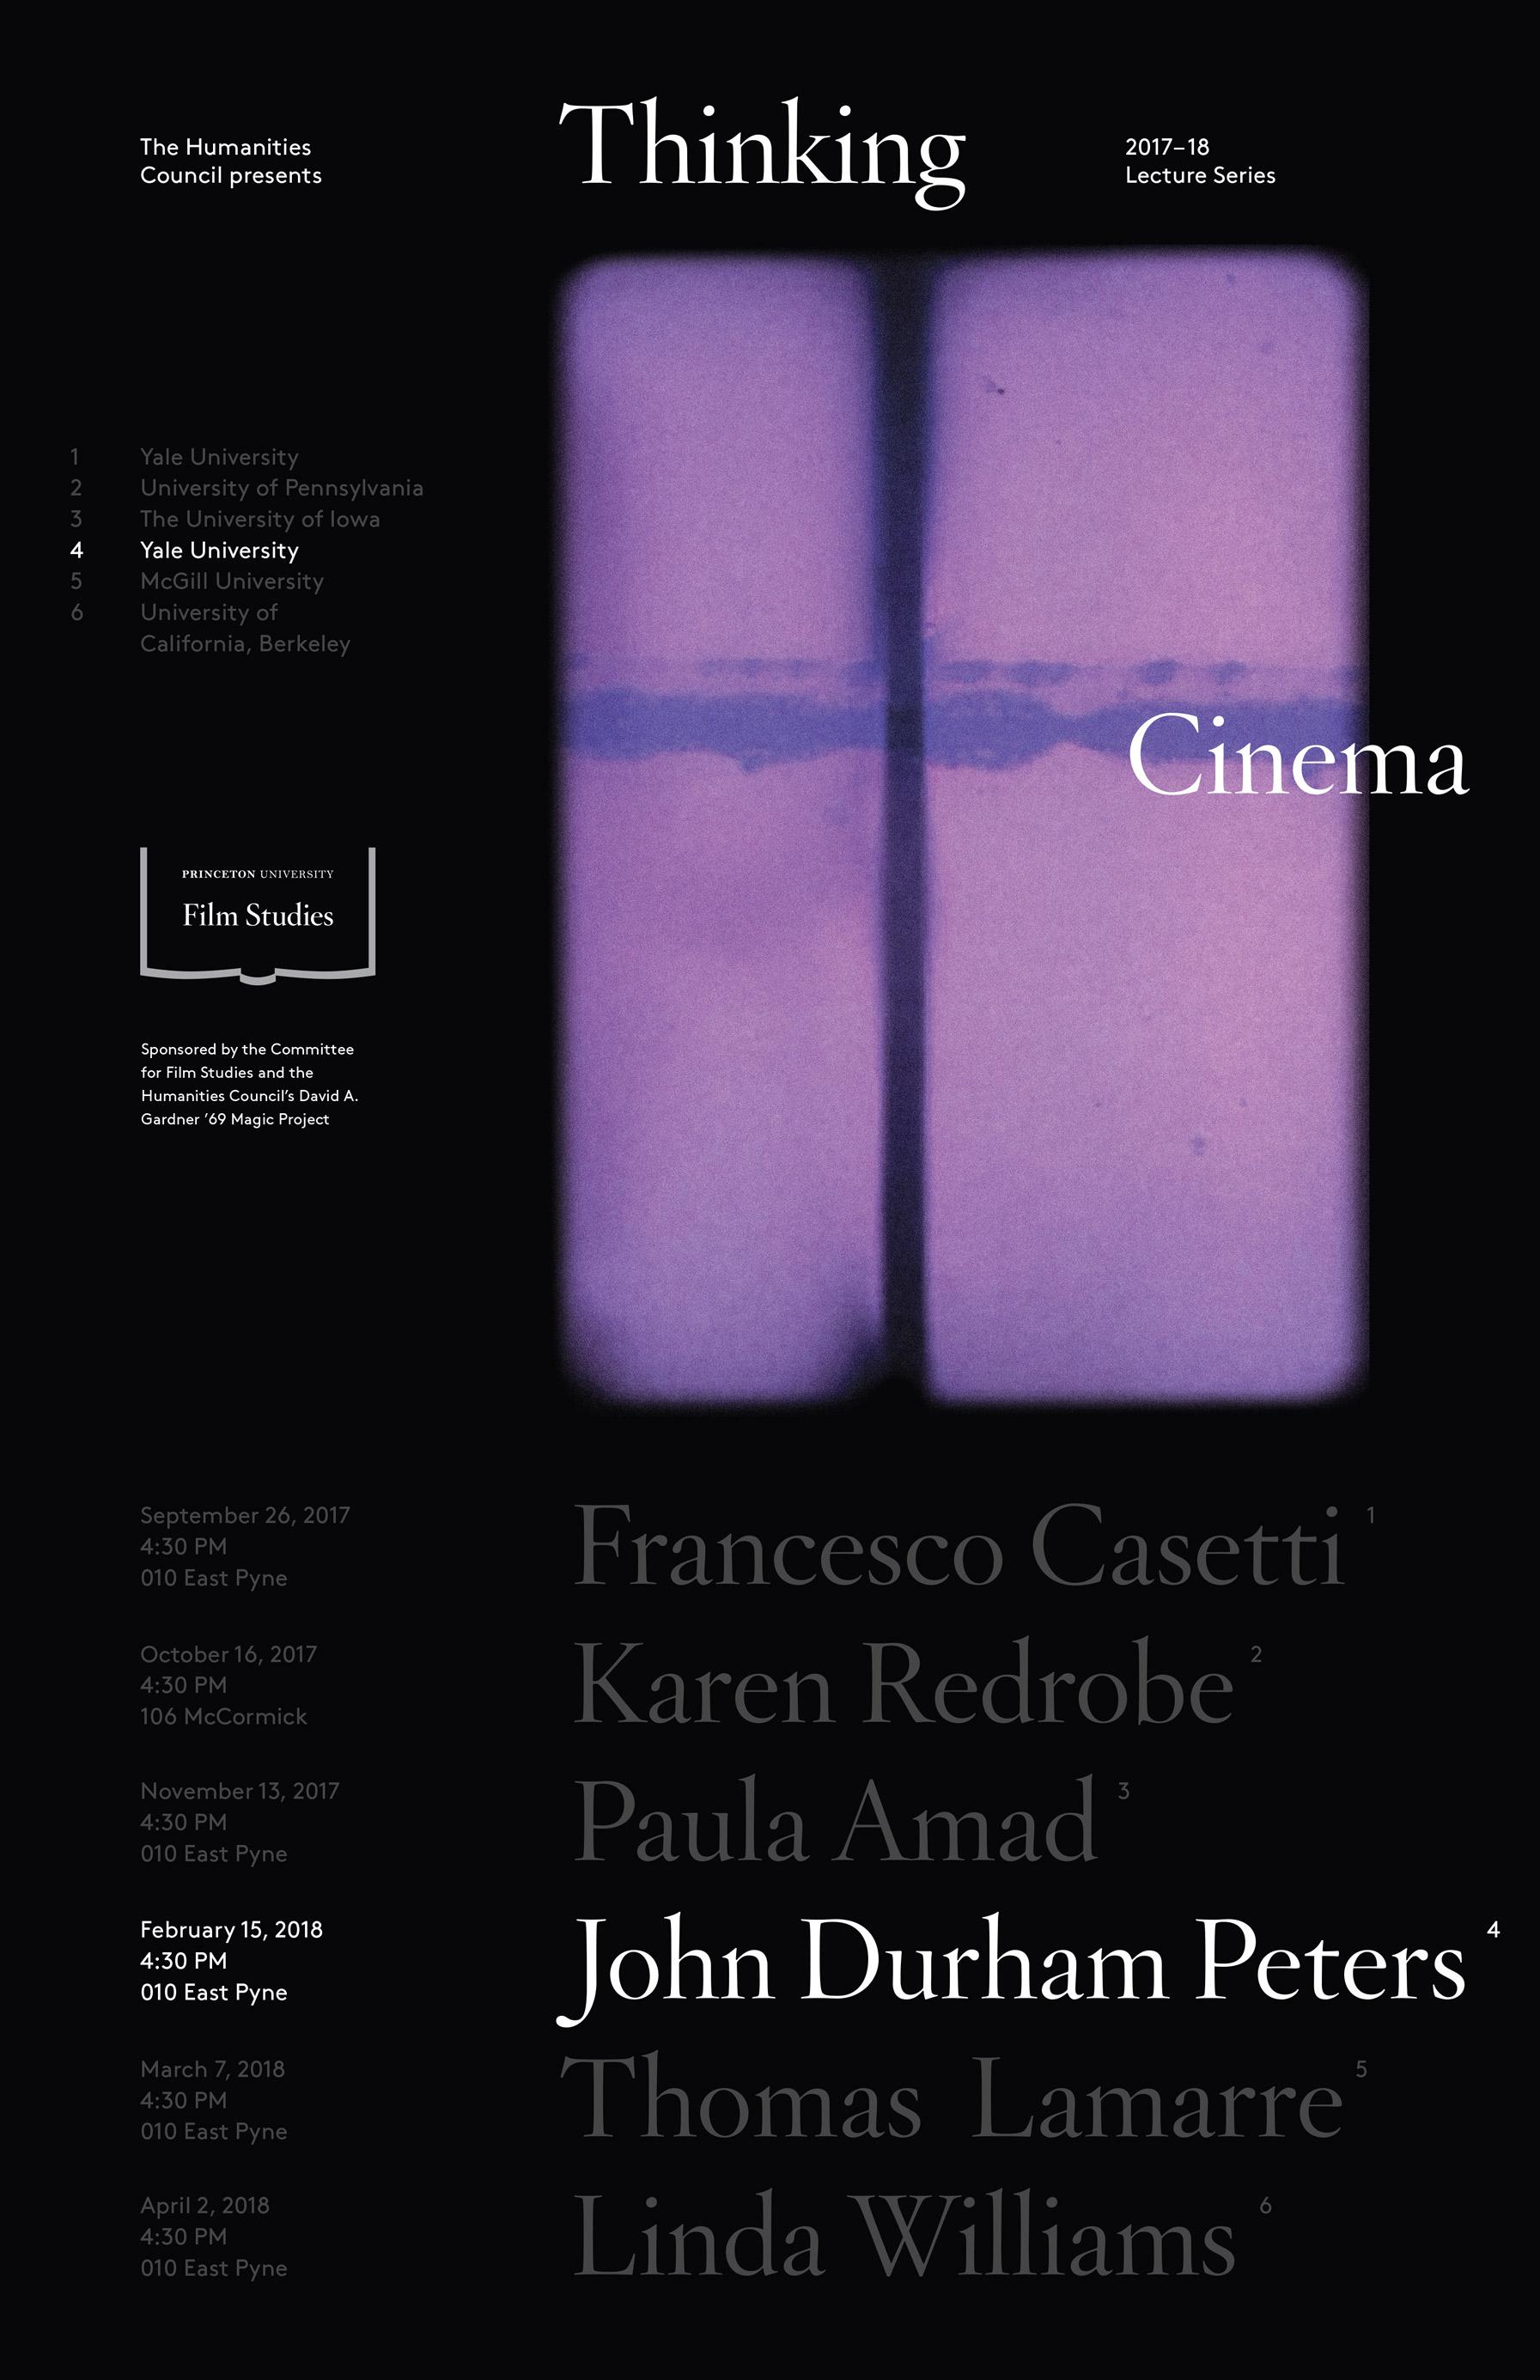 Thinking-Cinema_ac-4.jpg